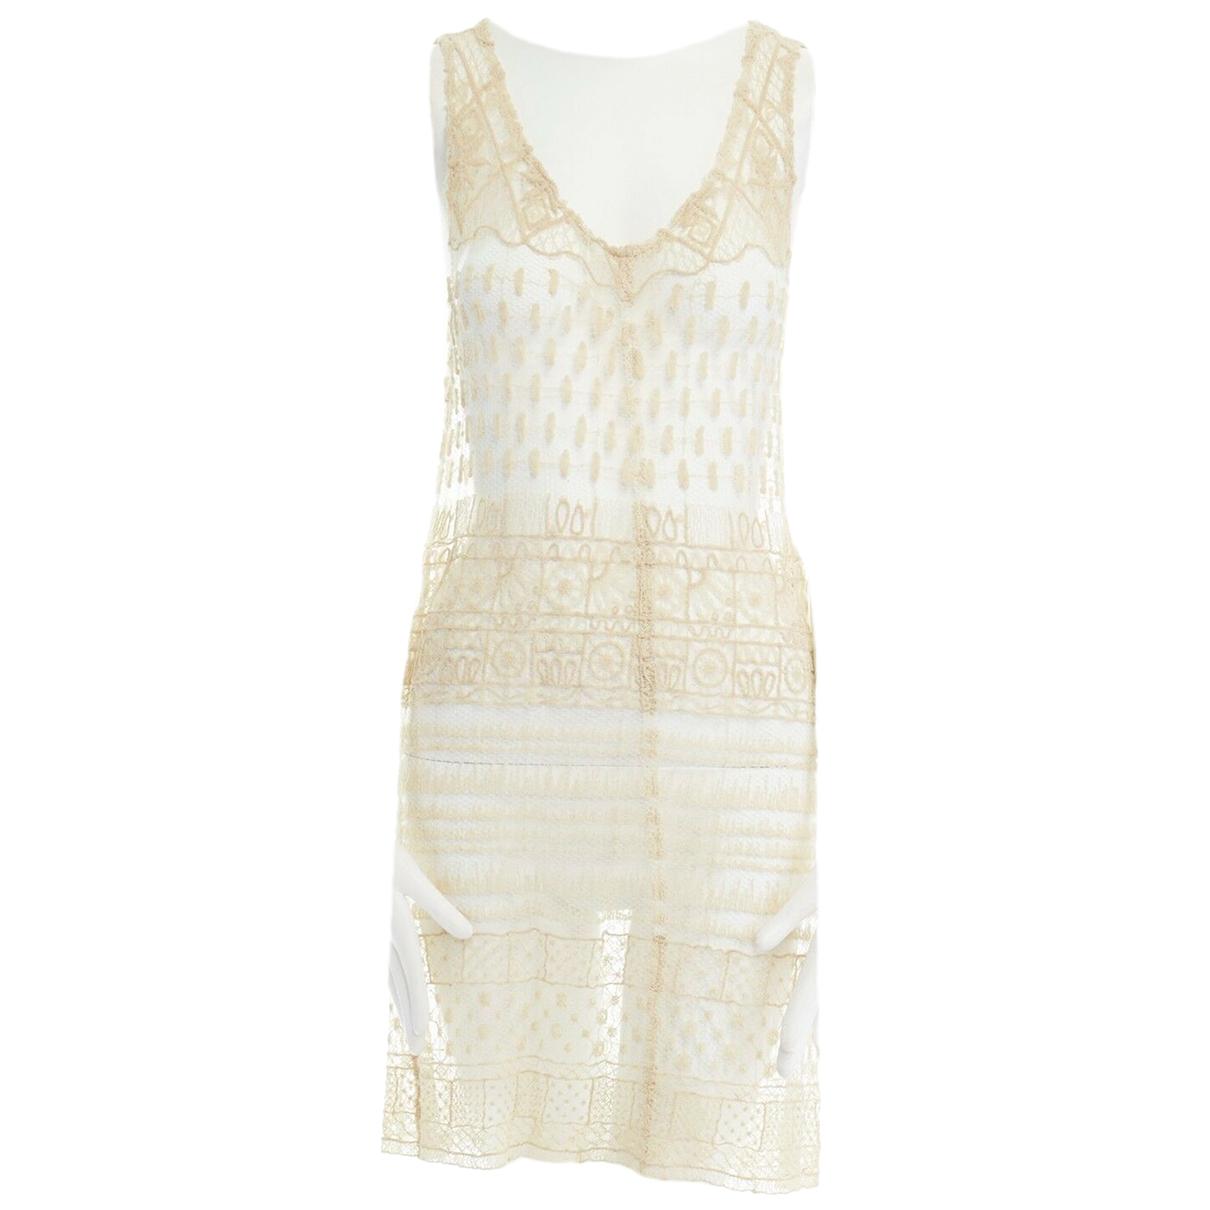 Ann Demeulemeester \N Beige Cotton dress for Women 38 FR